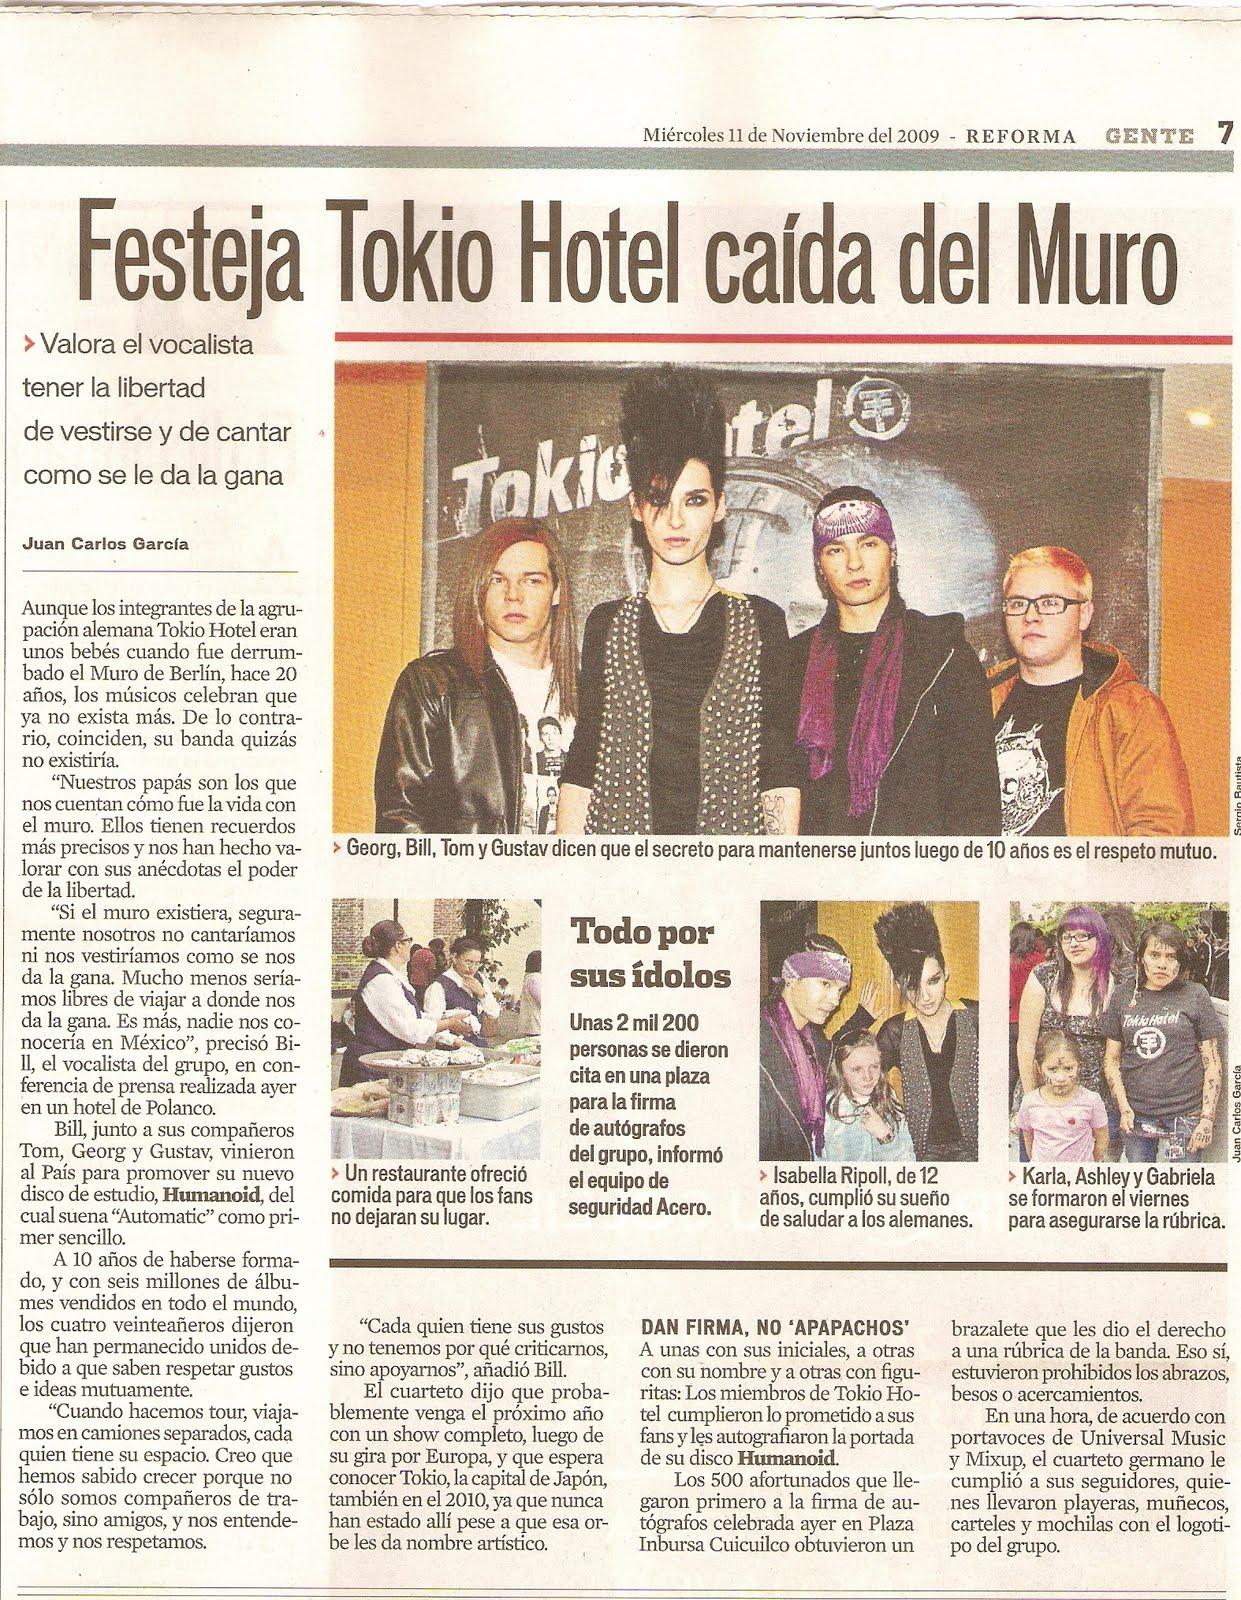 http://1.bp.blogspot.com/_sAL9O_AlbTA/SwdkIjSFetI/AAAAAAAAA40/_9vuUSwS_9o/s1600/tokio+Hotel,+periodico+reforma.jpg